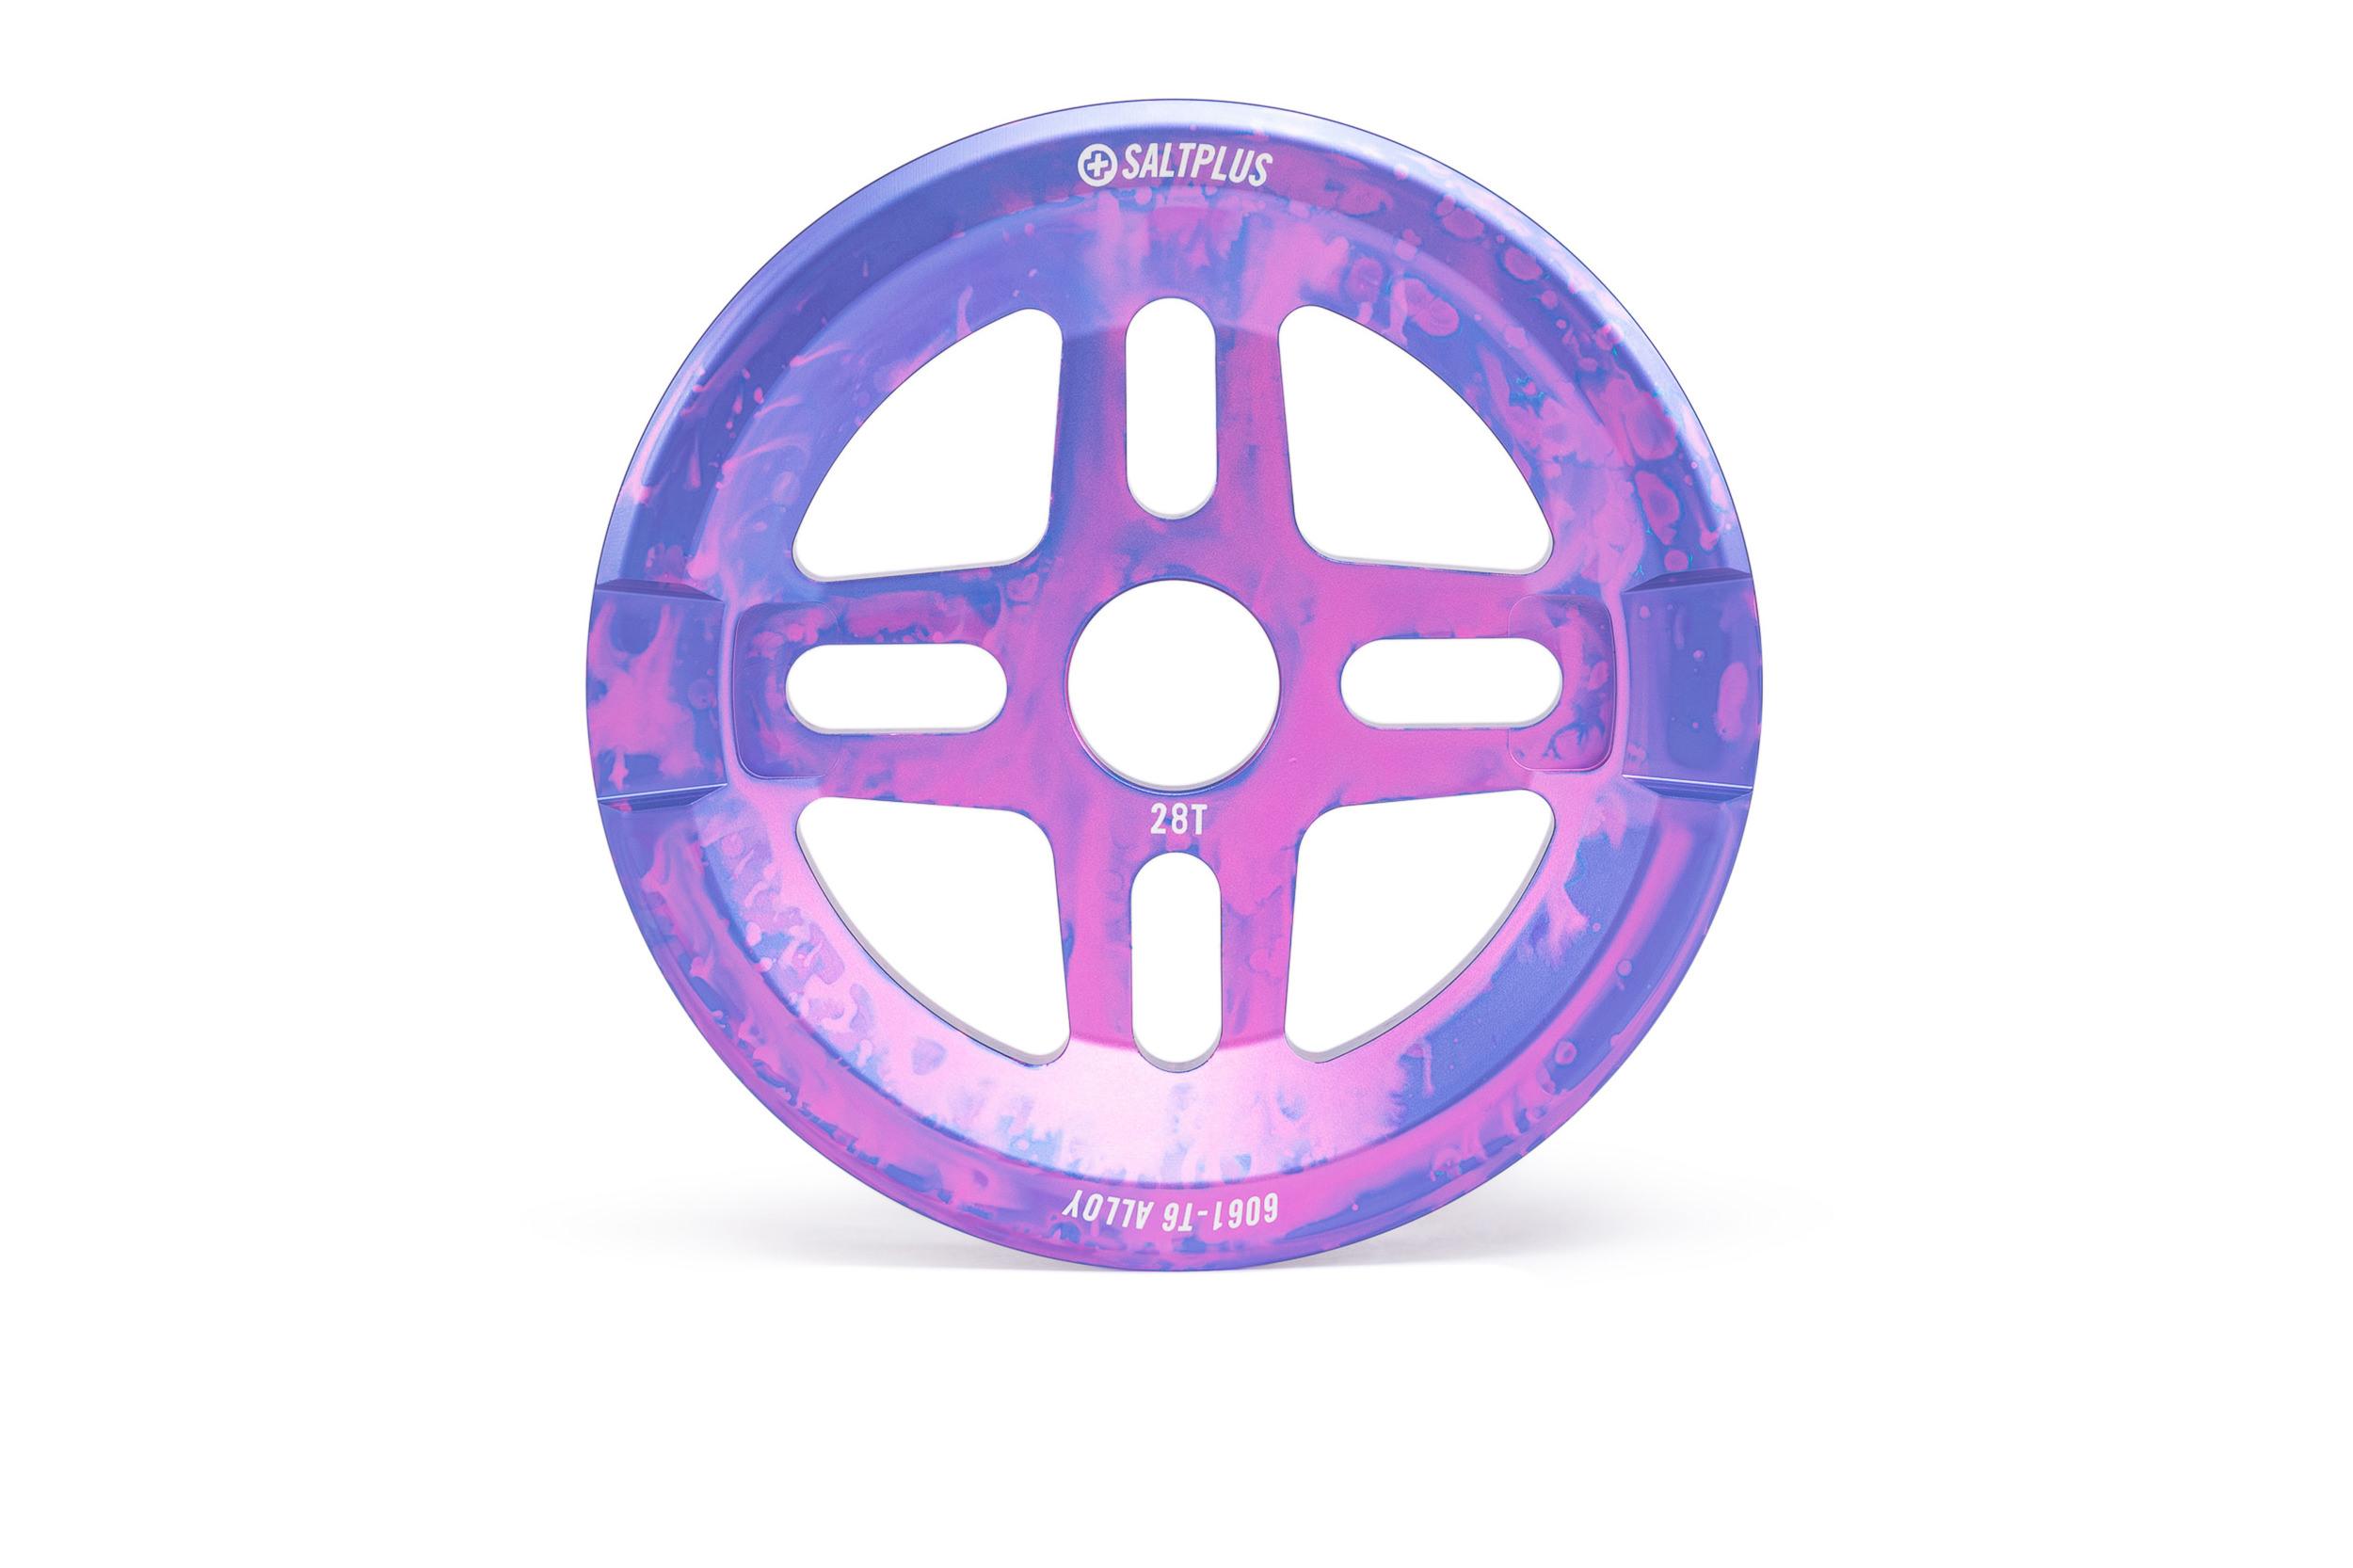 SaltPlus_Orion_sprocket_guard_28t_nebula_purple-01